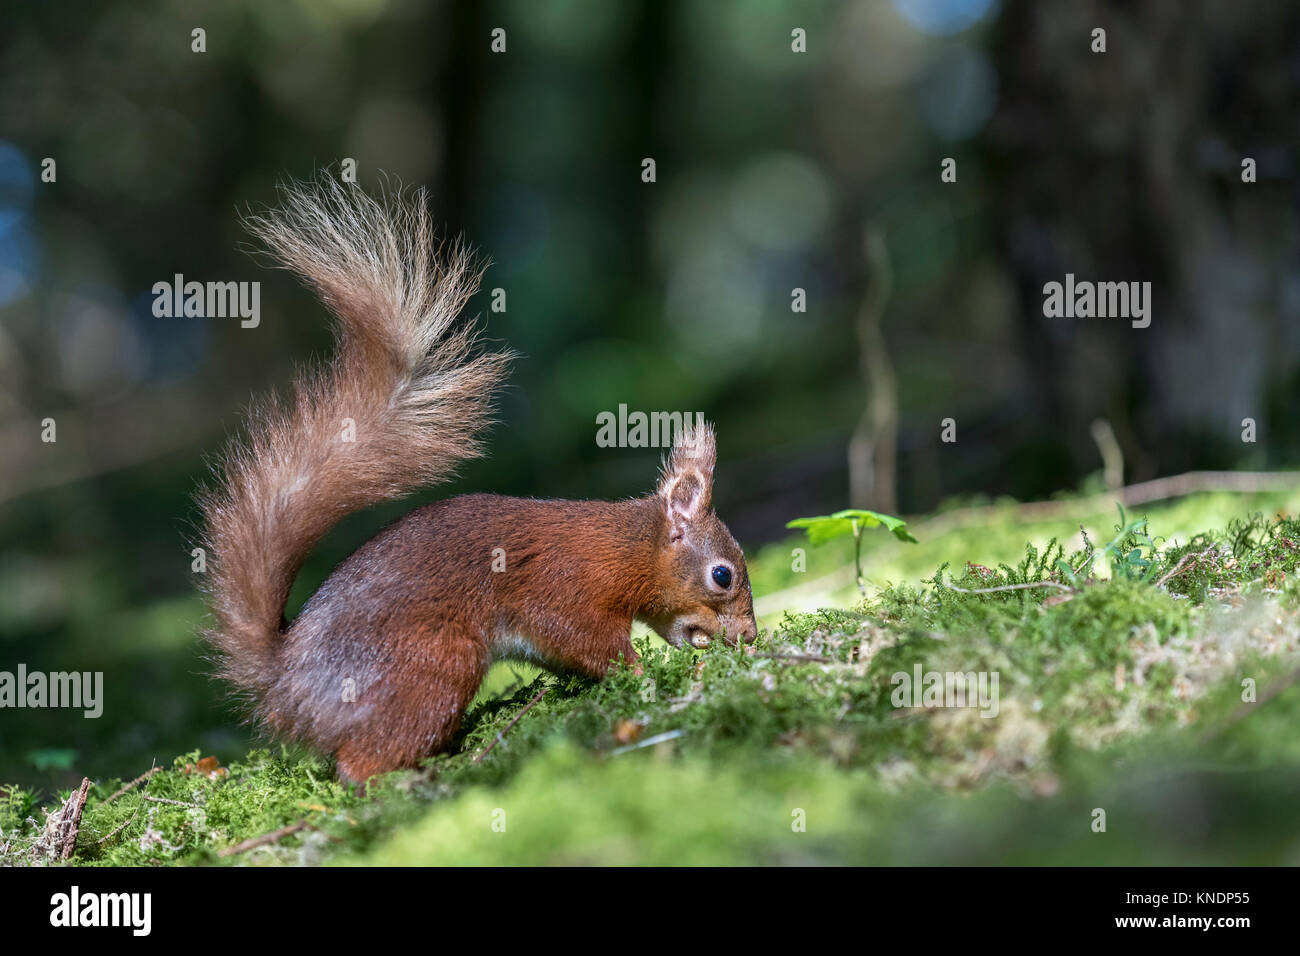 Red Squirrel; Sciurus vulgaris Single Burrying a Nut Yorkshire; UK - Stock Image